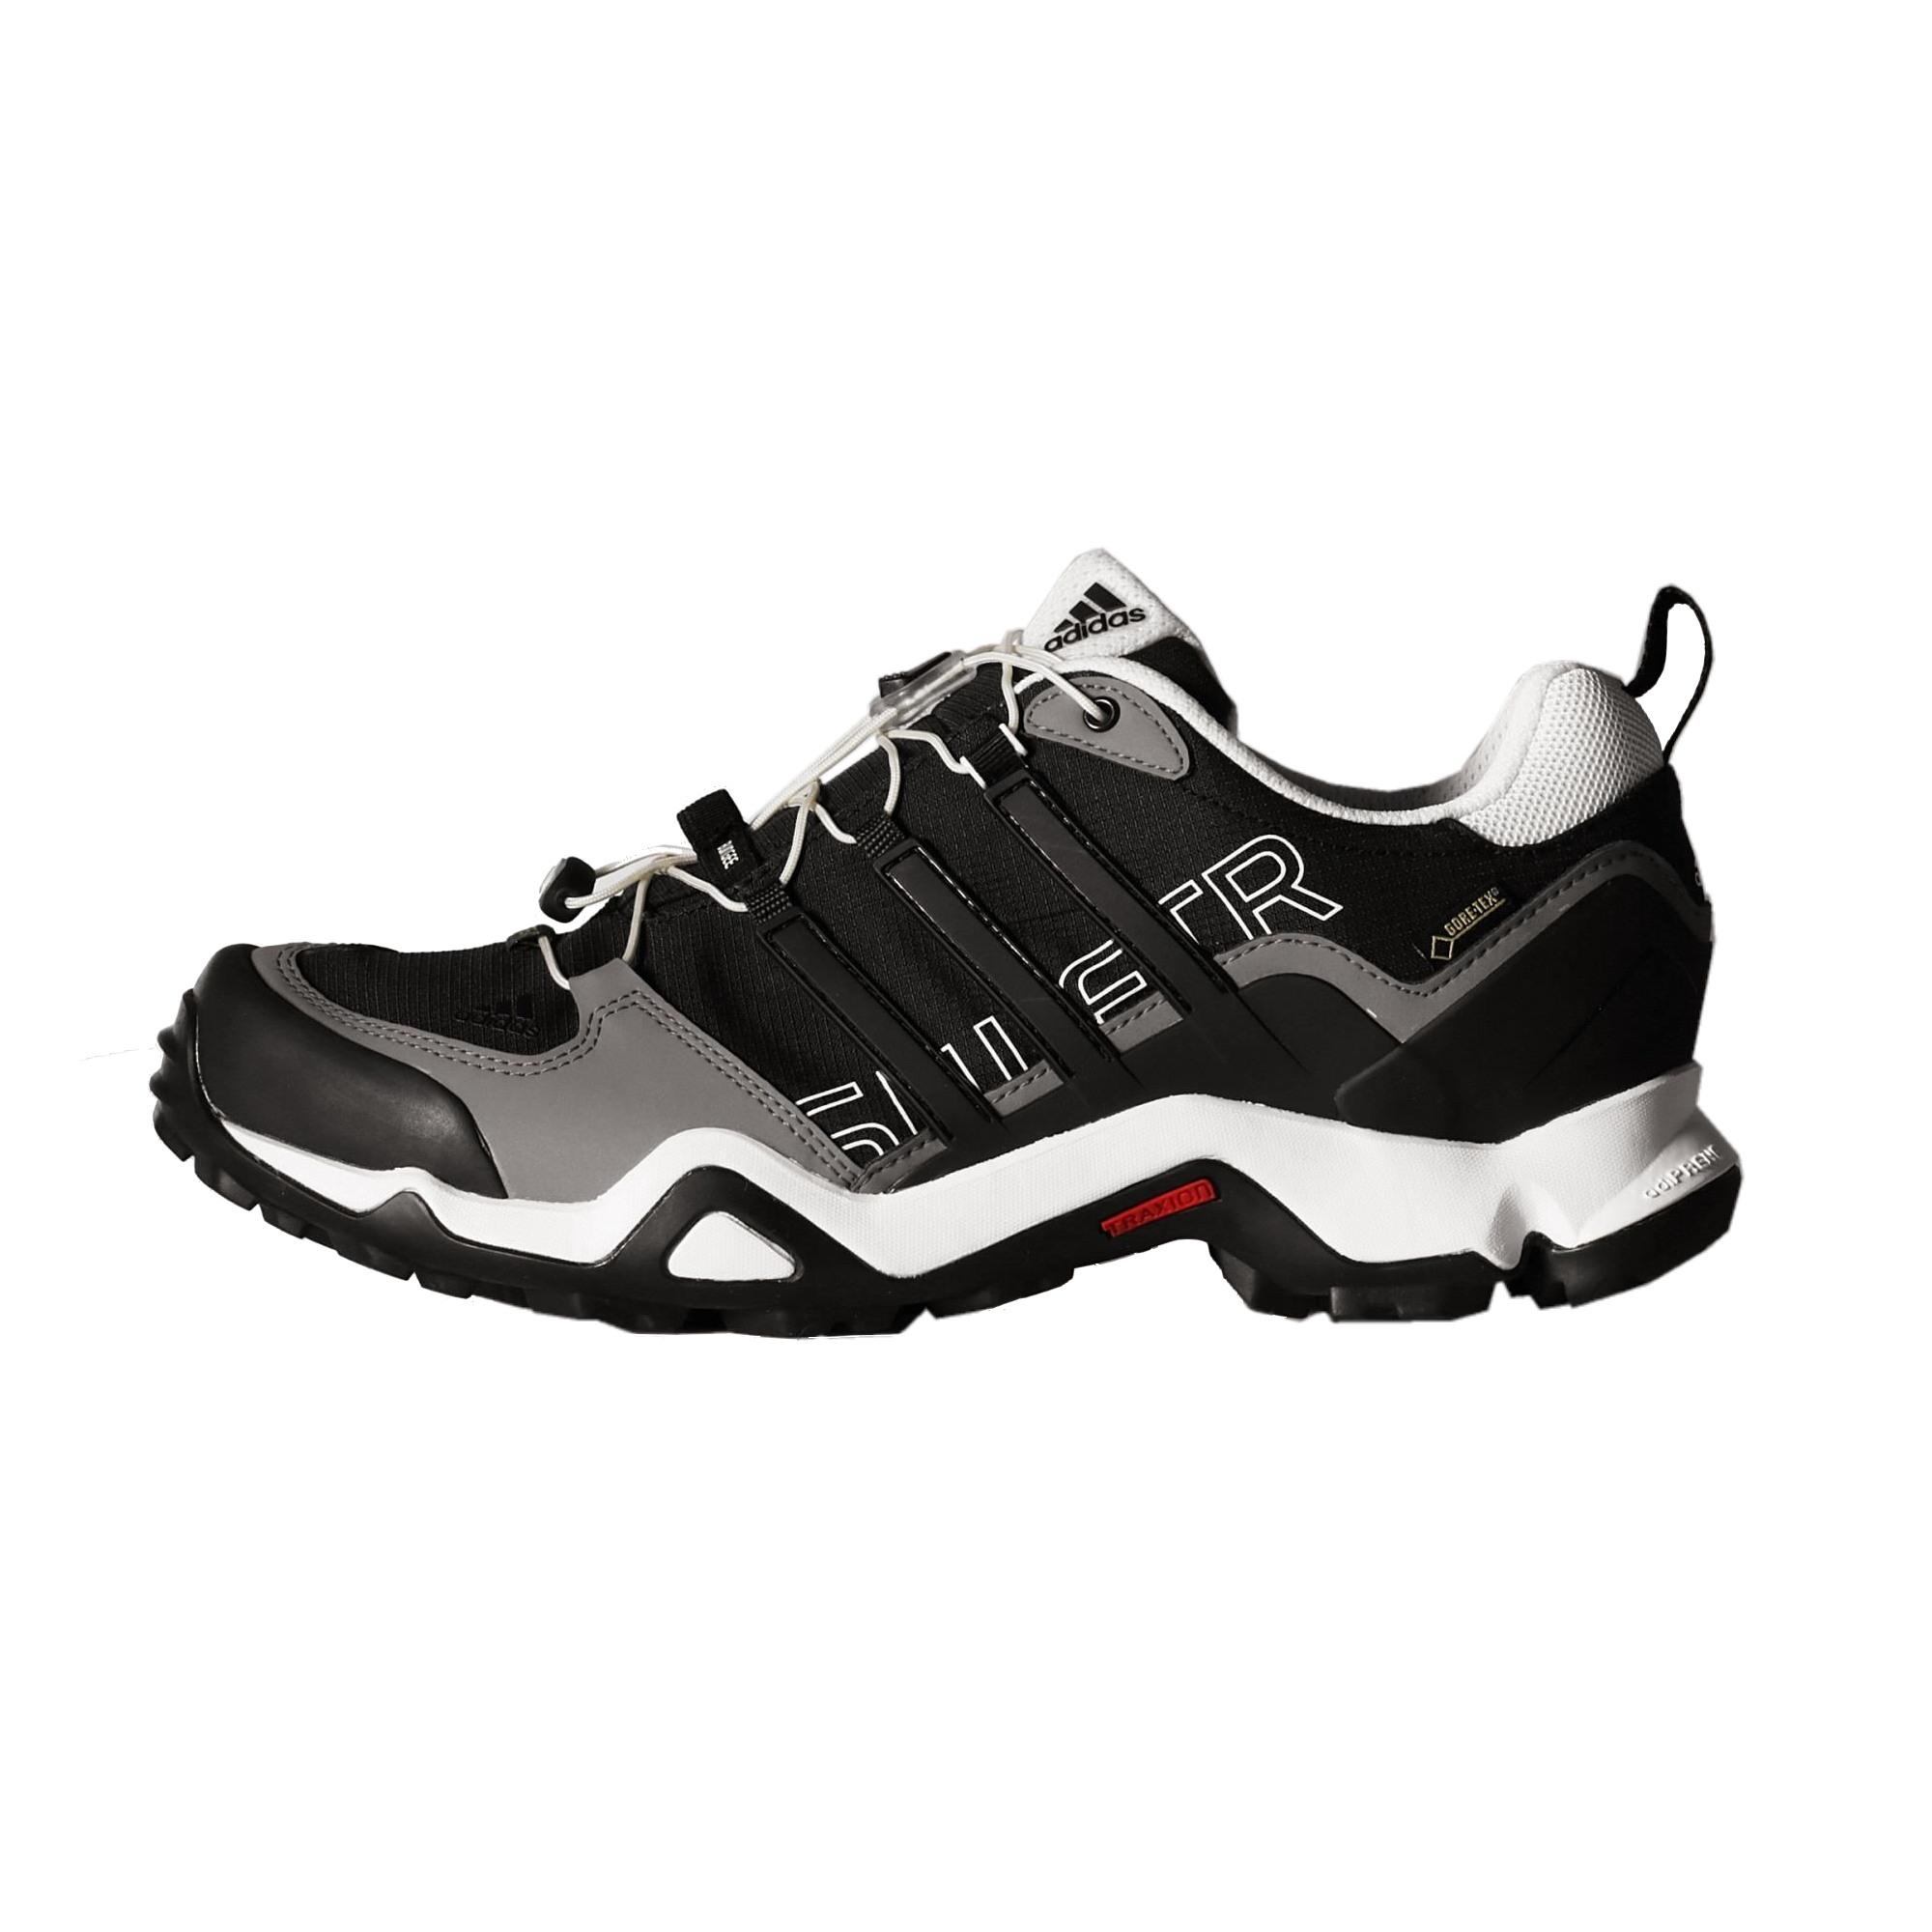 adidas terrex swift r gtx men 39 s gore tex shoes hiking. Black Bedroom Furniture Sets. Home Design Ideas